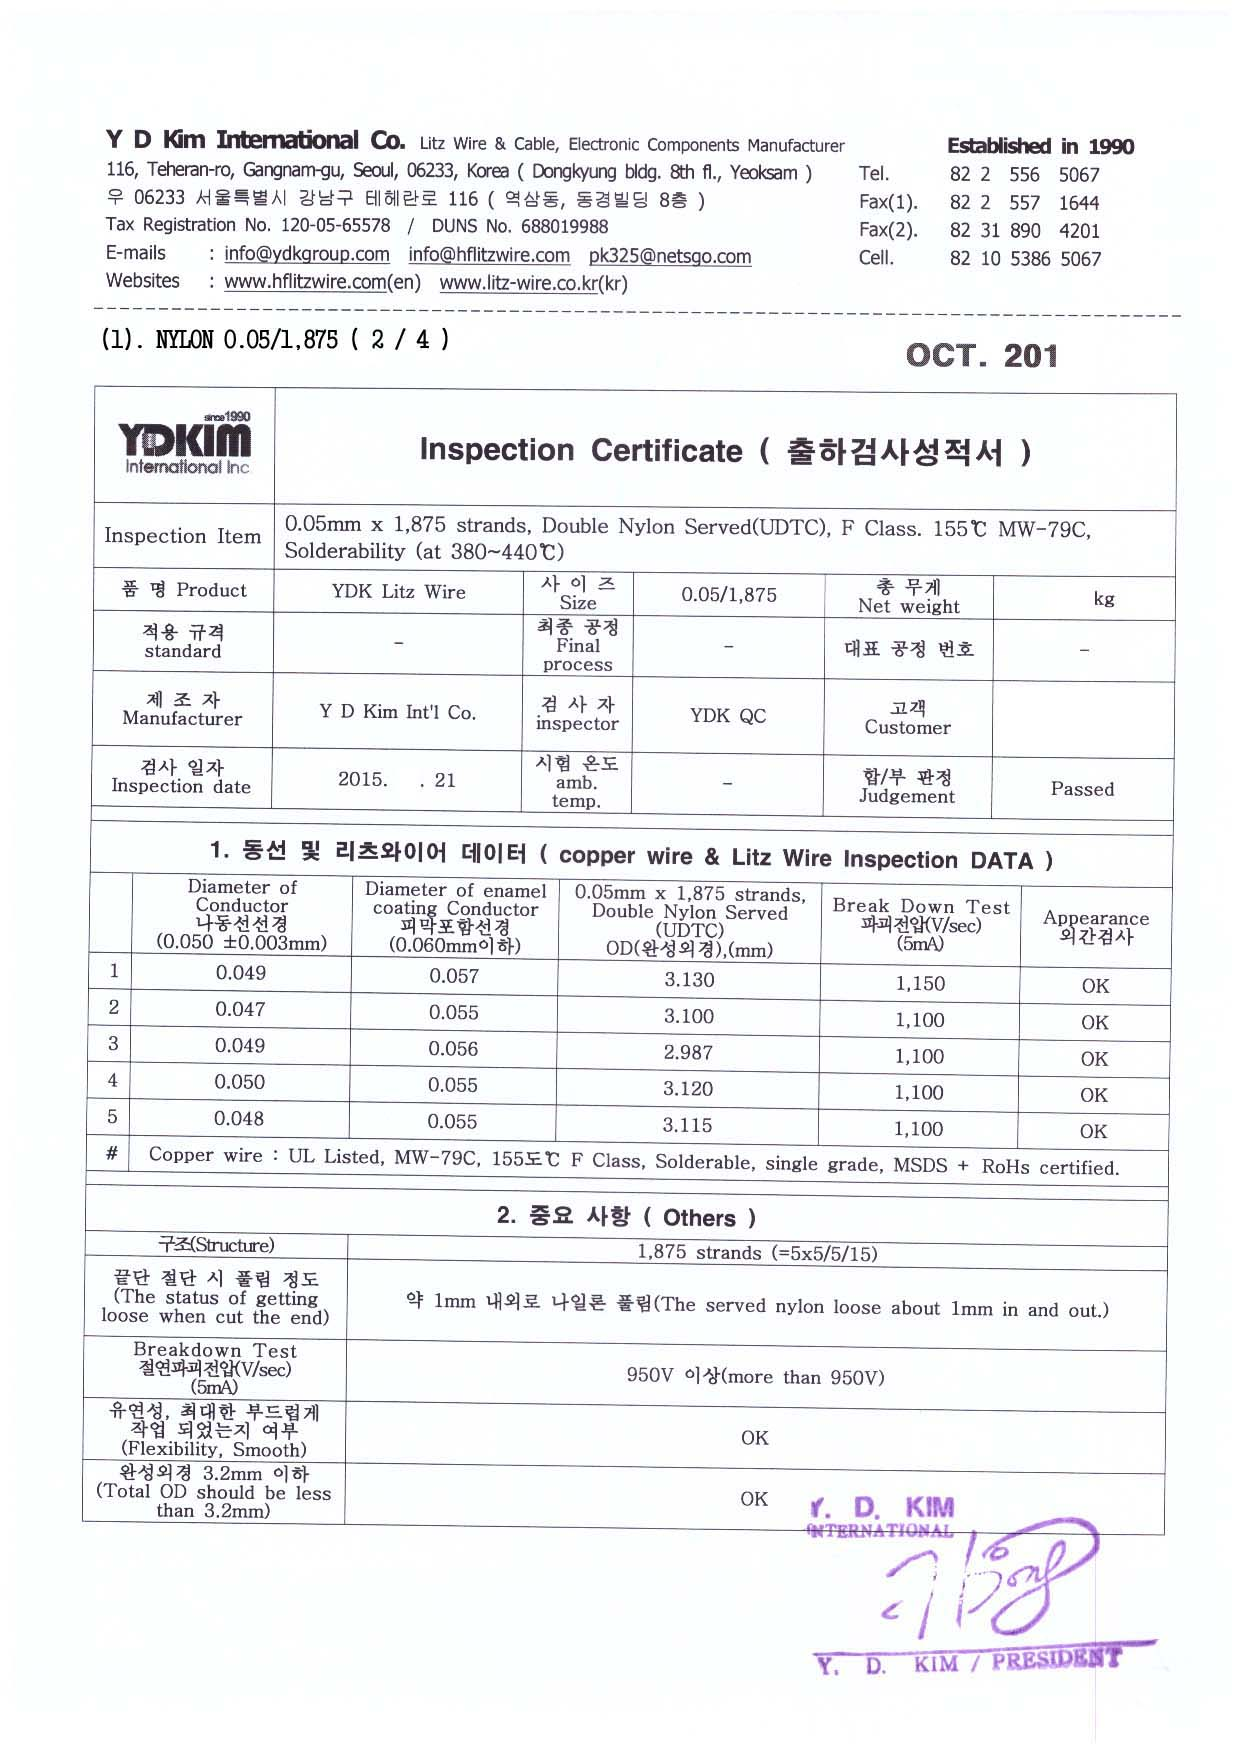 Litz Wire shipment inspection certificate